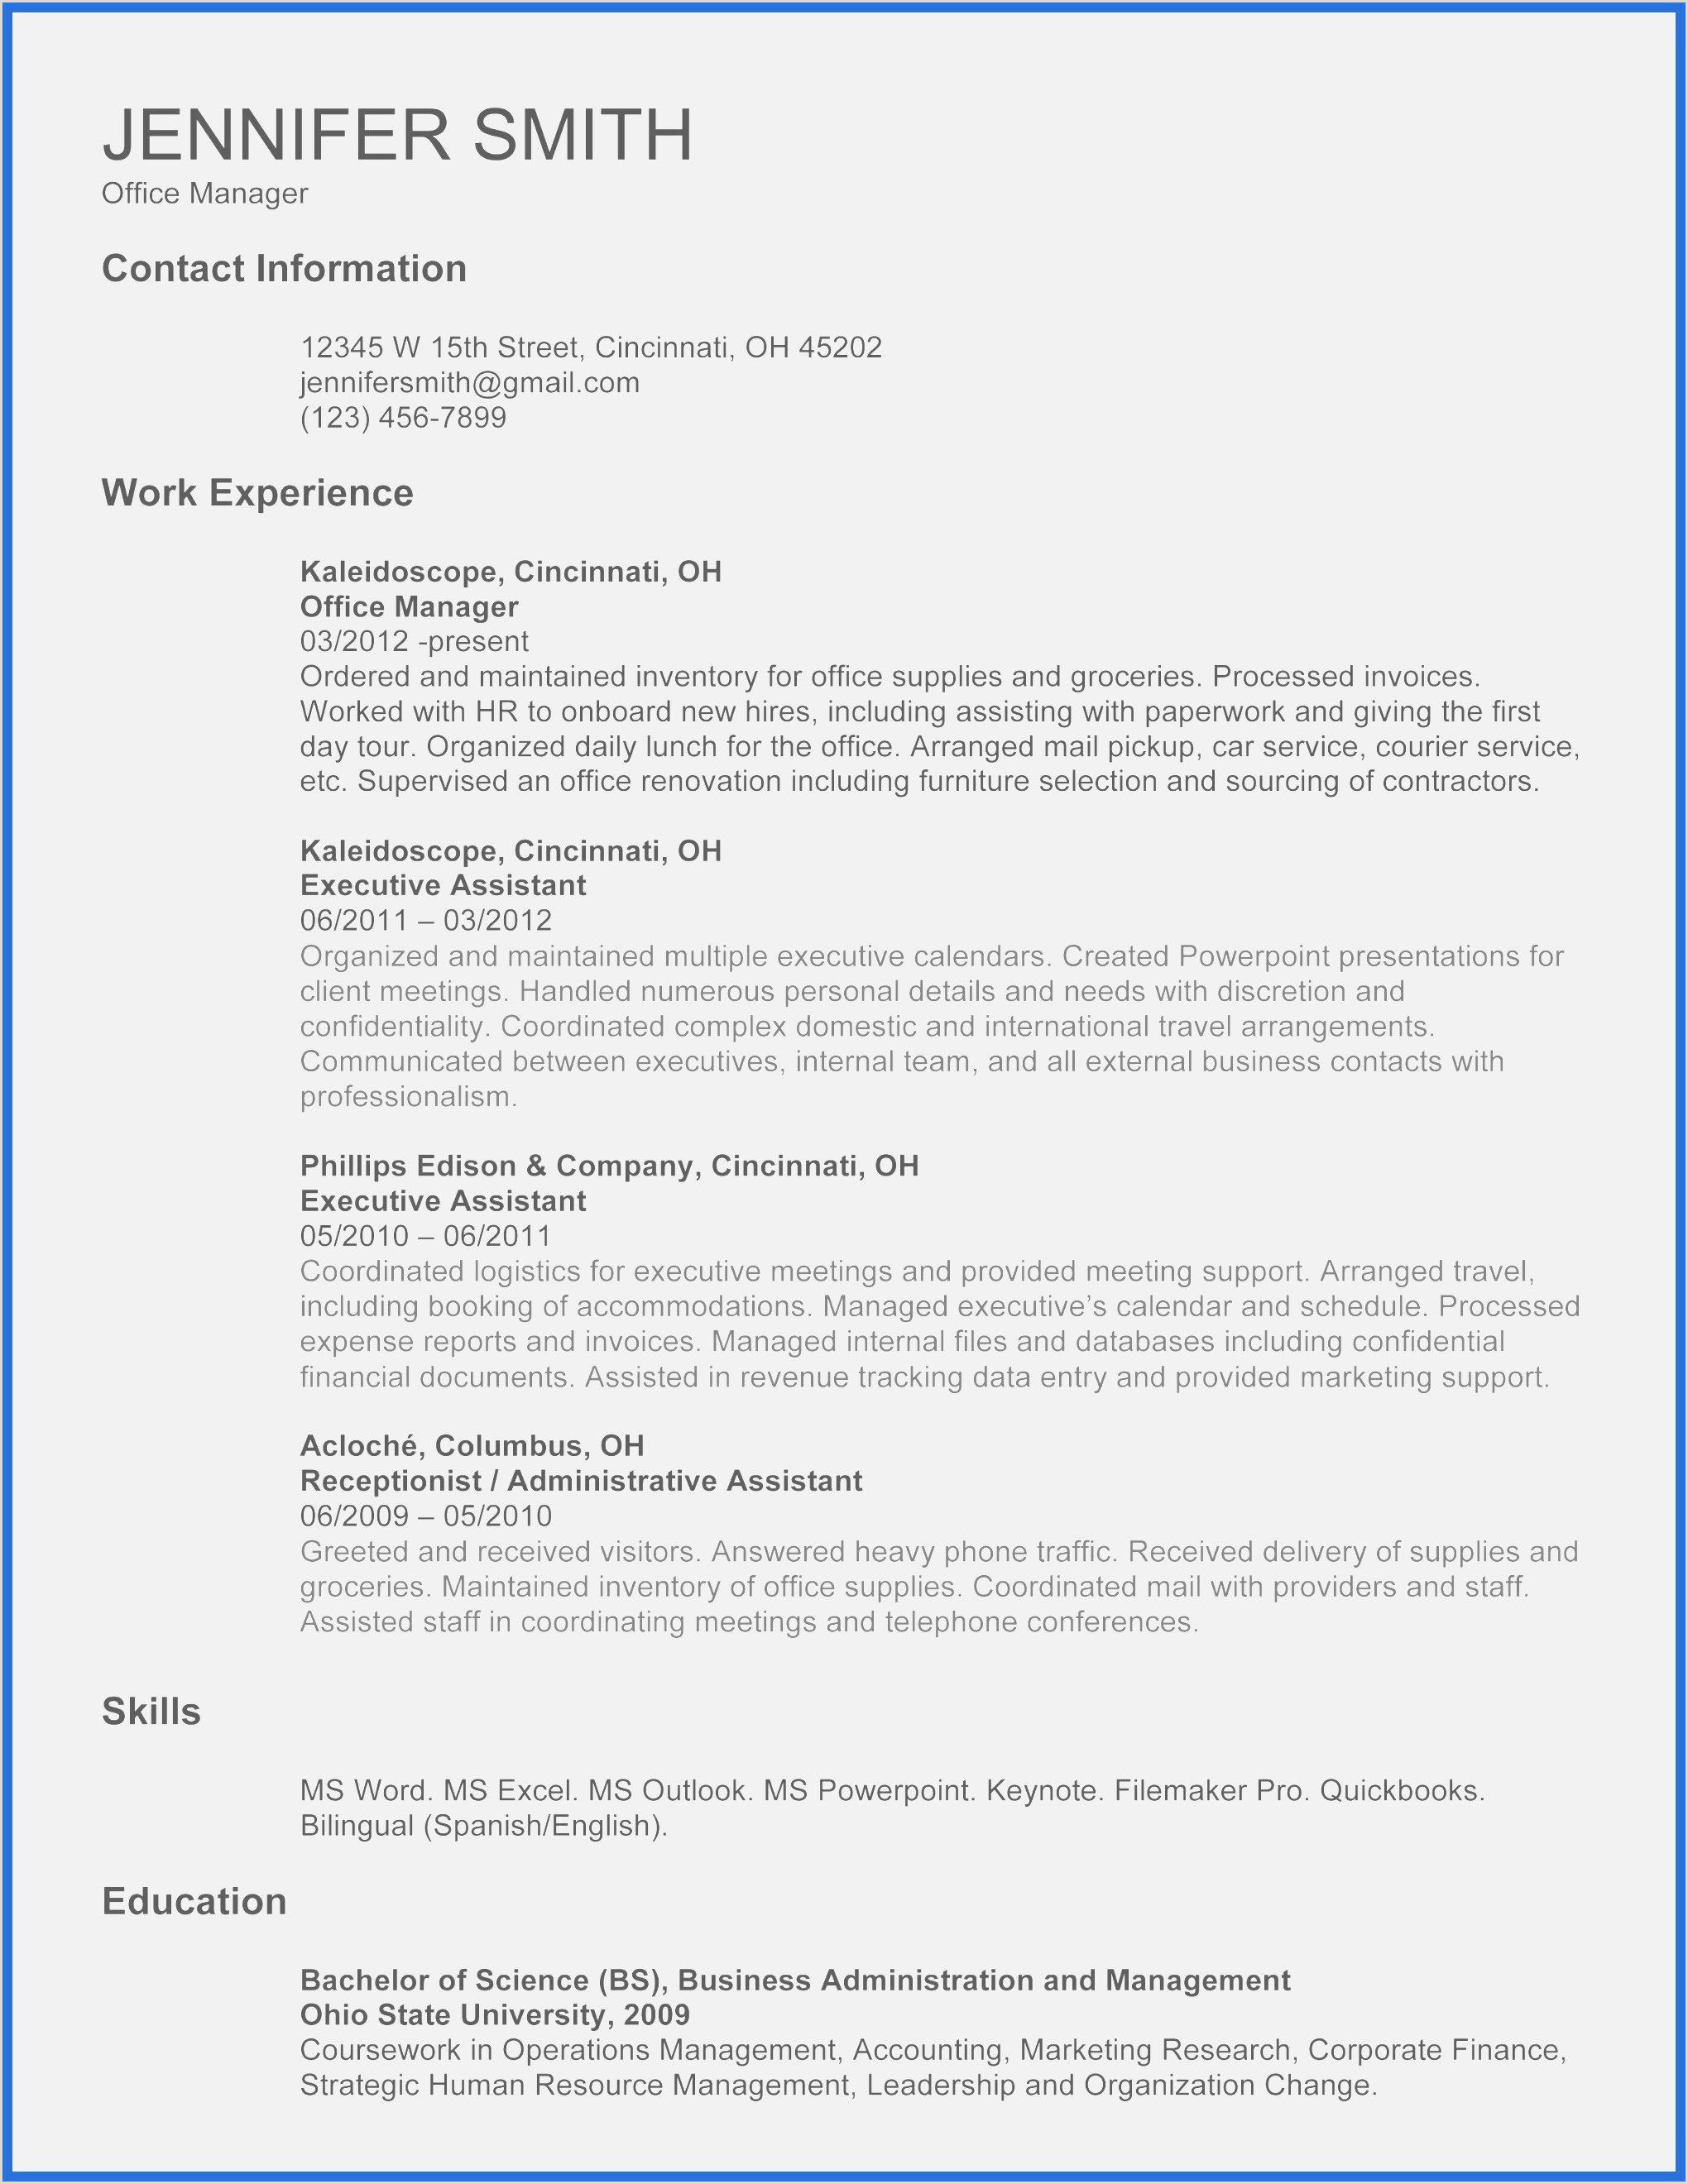 Resume Template Microsoft Word 2010 – Salumguilher